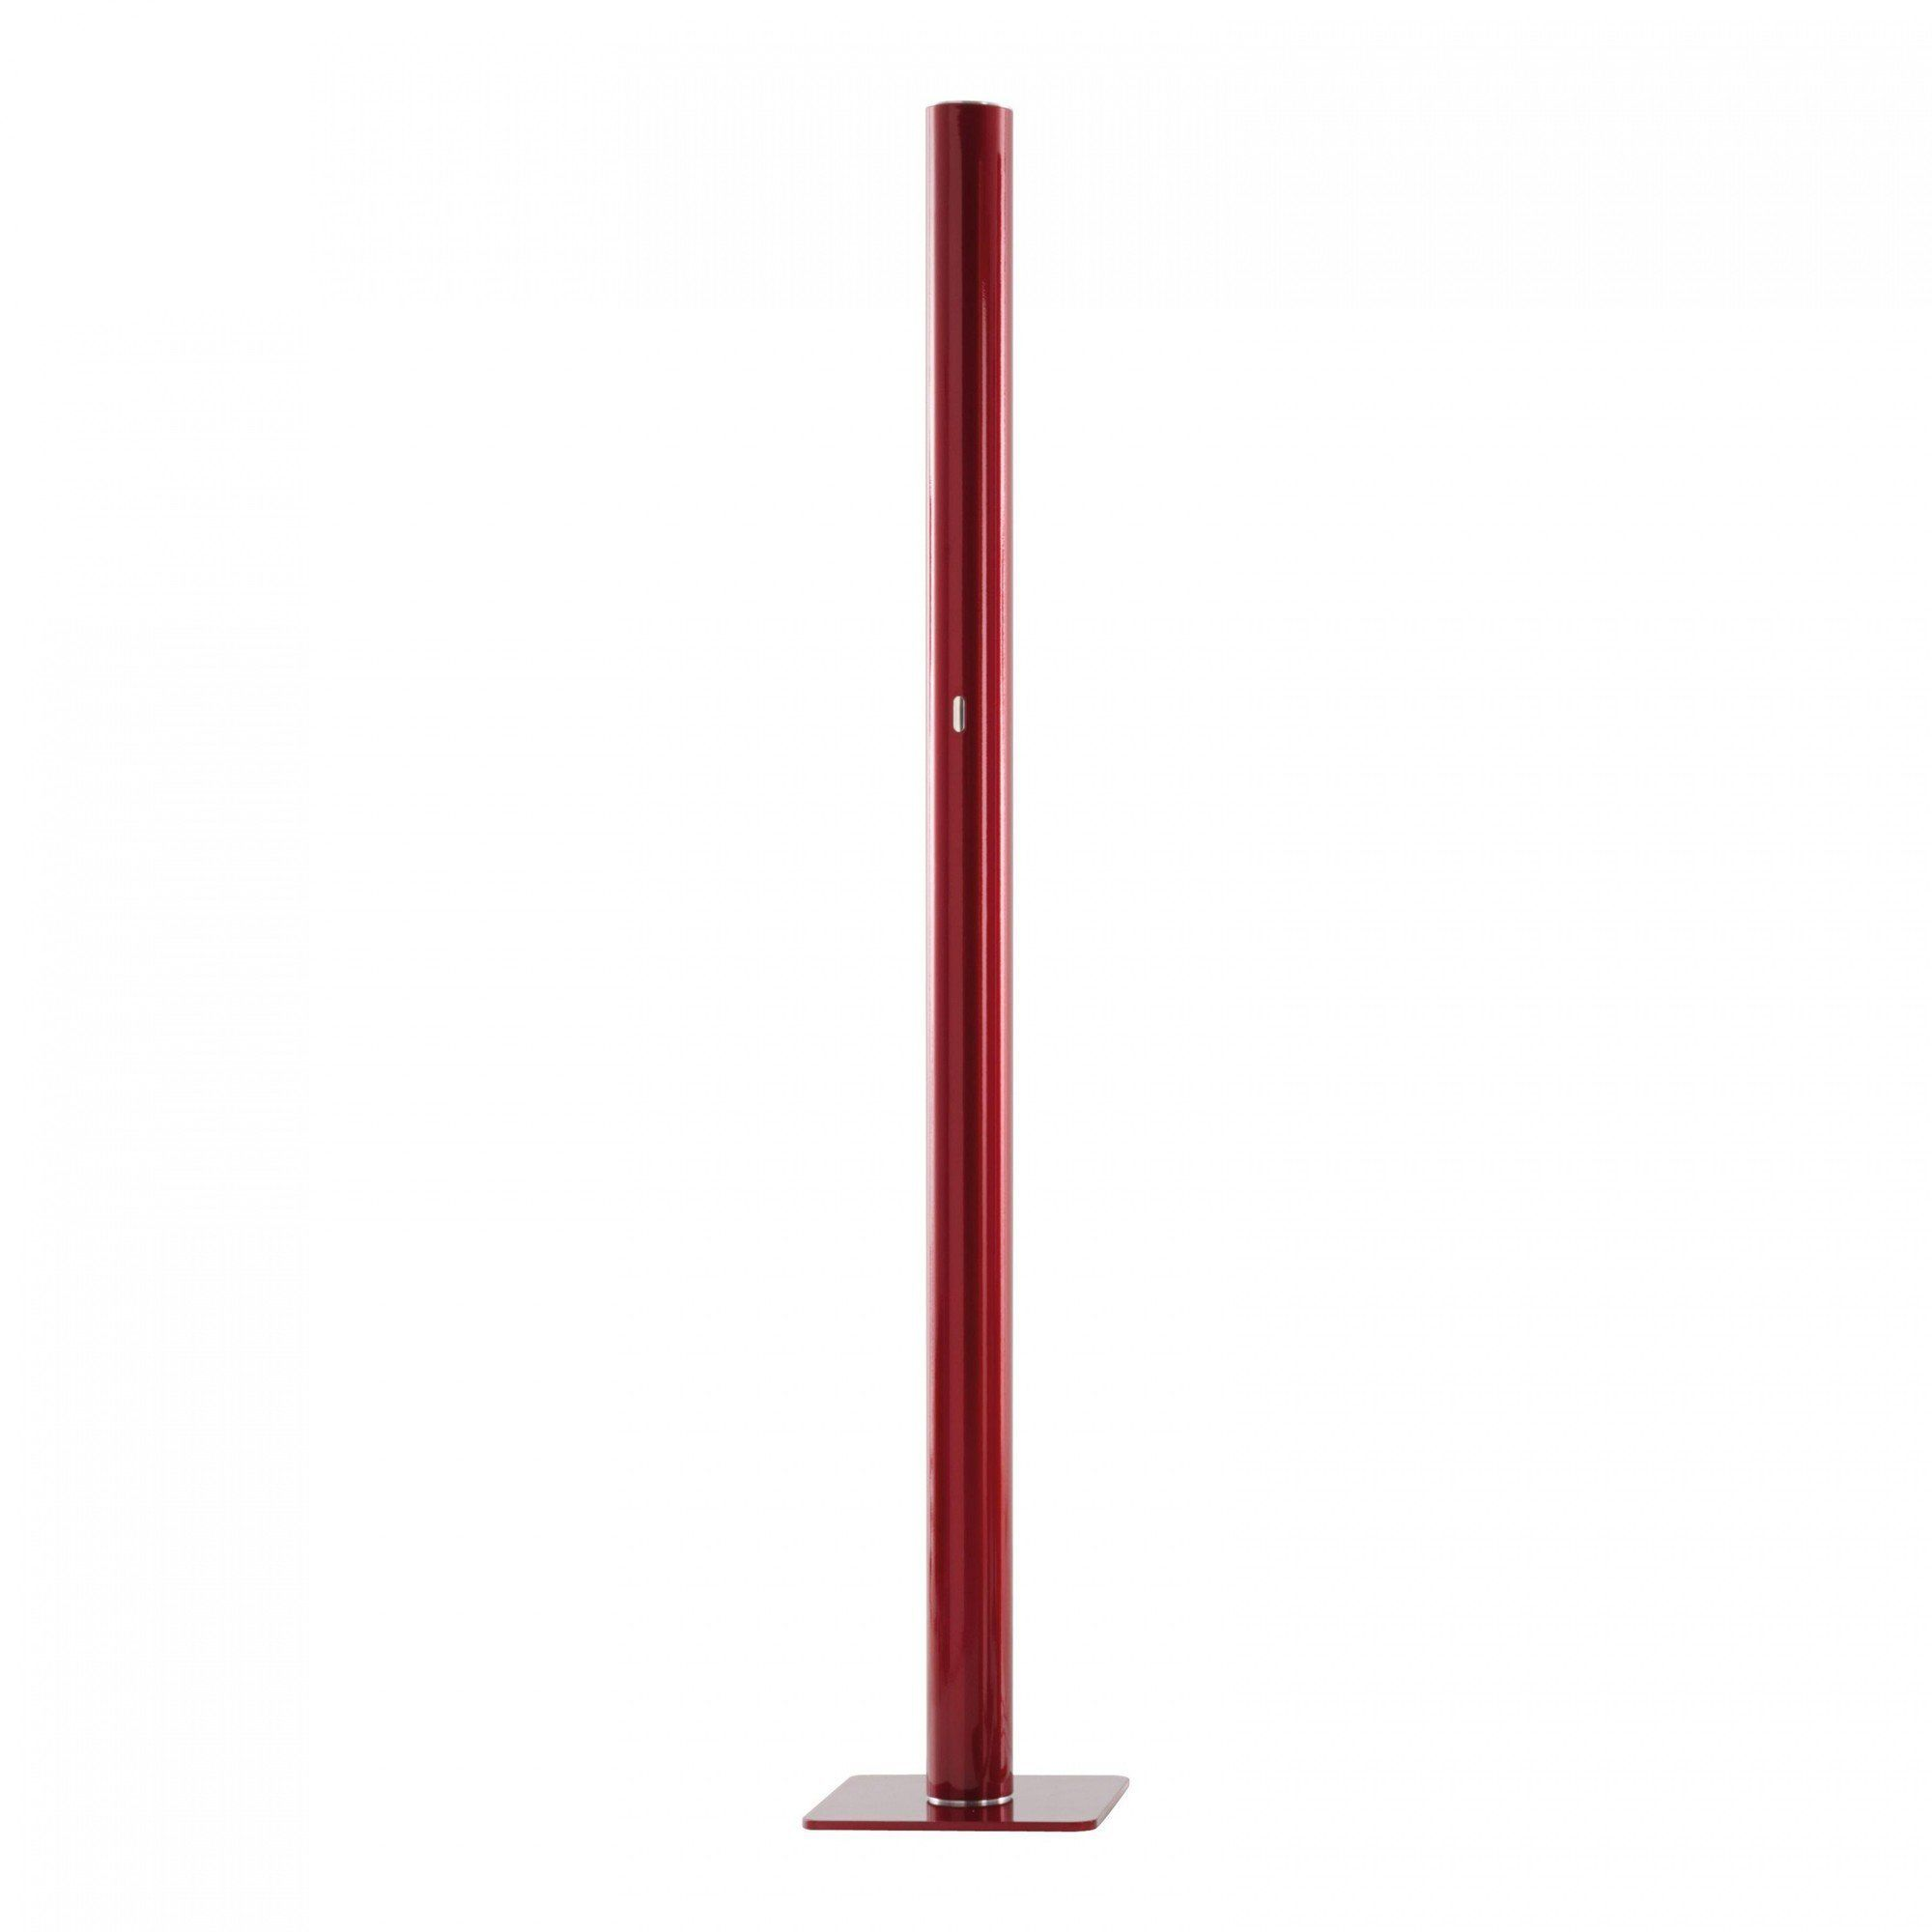 Artemide  Ilio Led Floor Lamp  Red3000K3900Lmh 175Cm